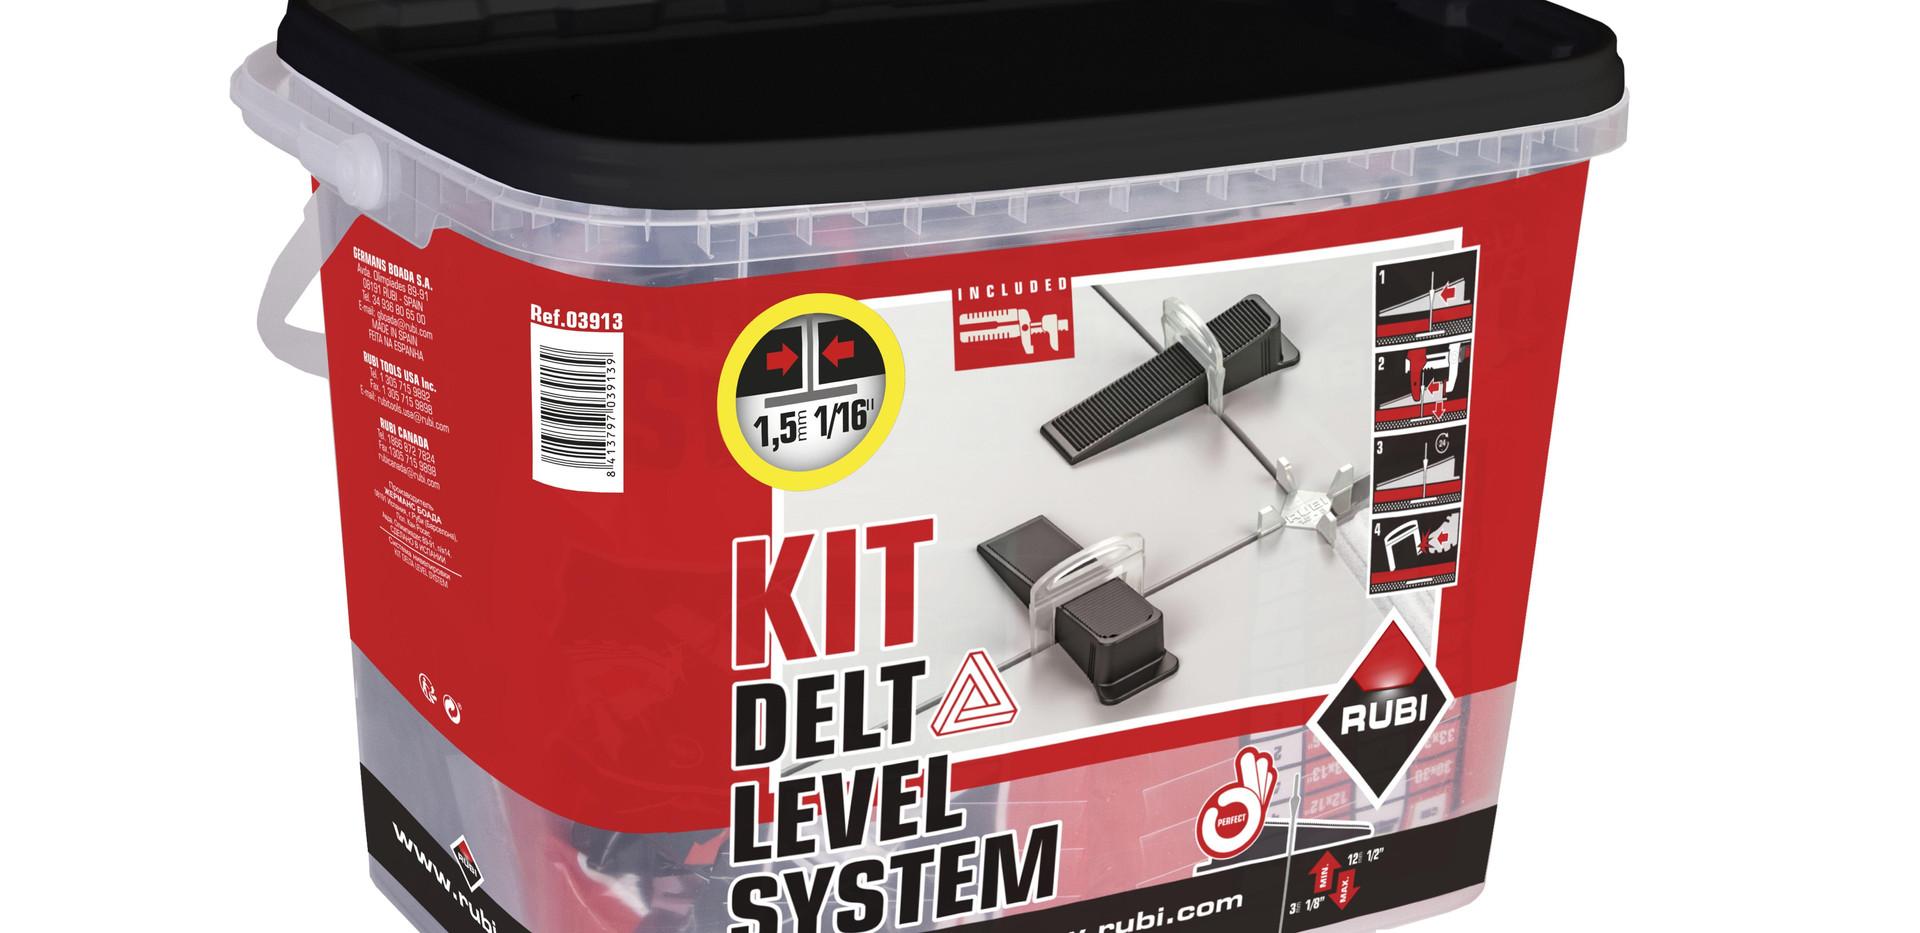 3914-kit-delta-levelling-system-brida-1-